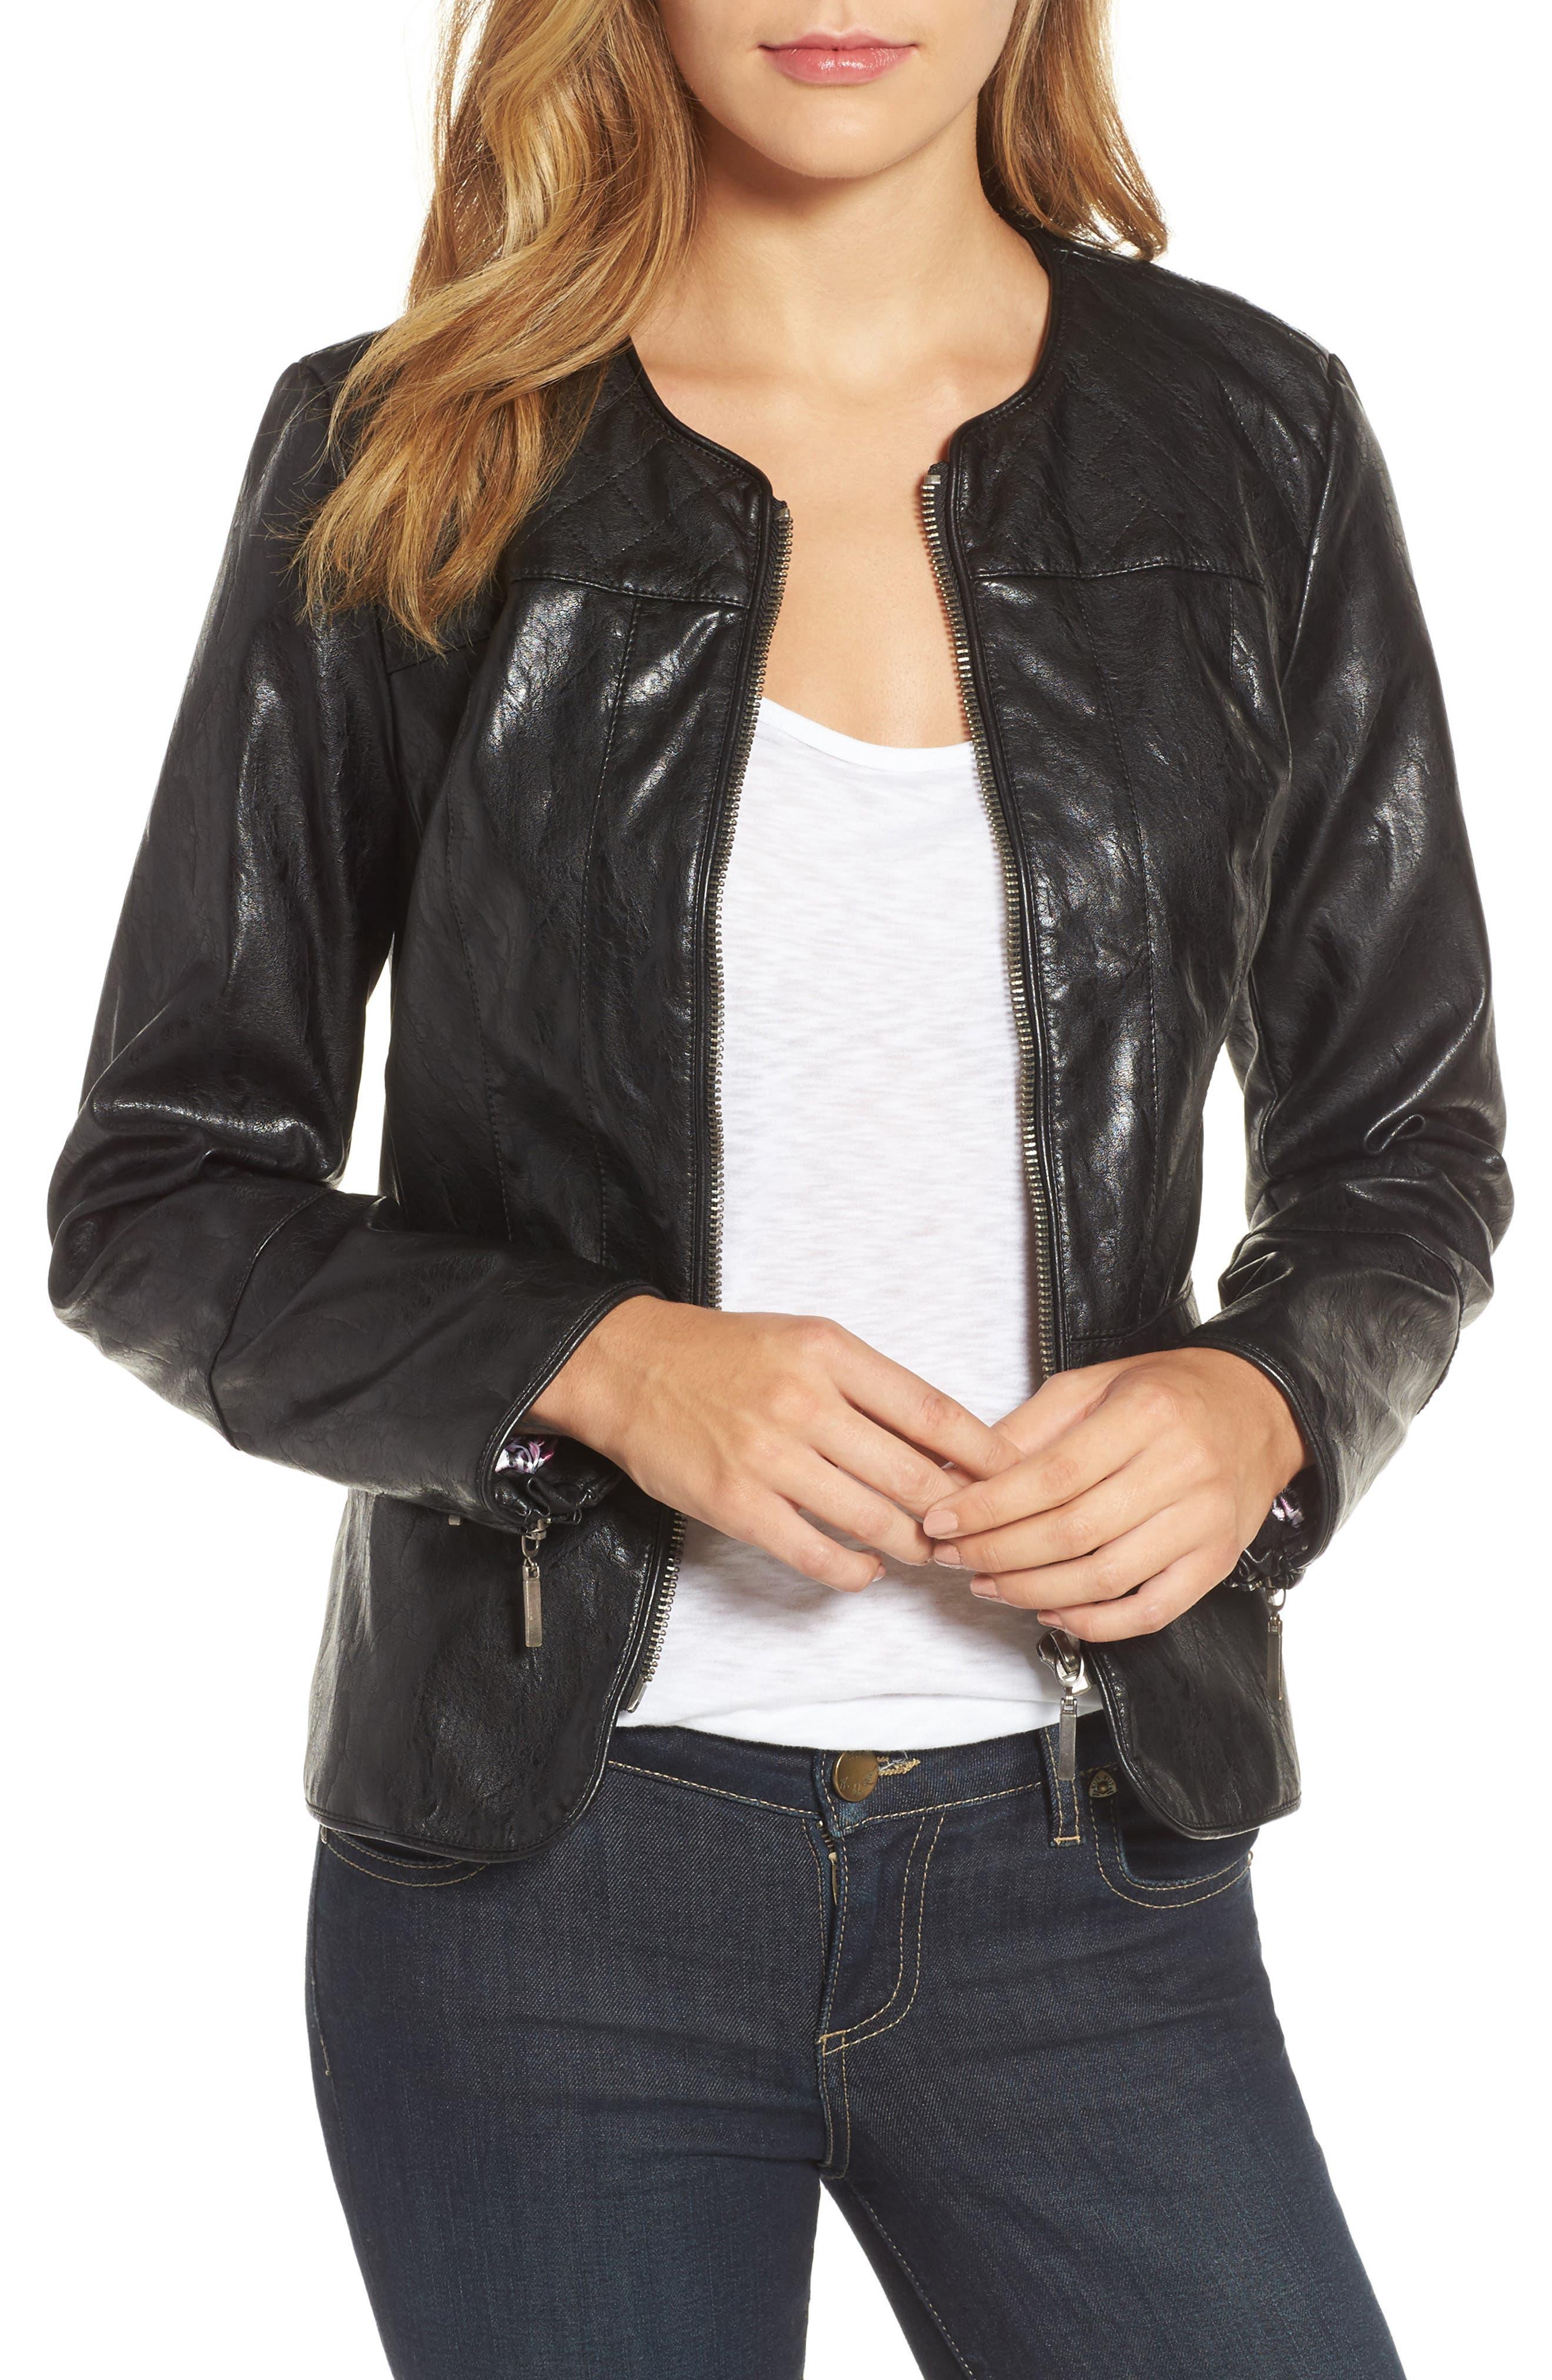 Brandy Motocross Jacket,                         Main,                         color, Black